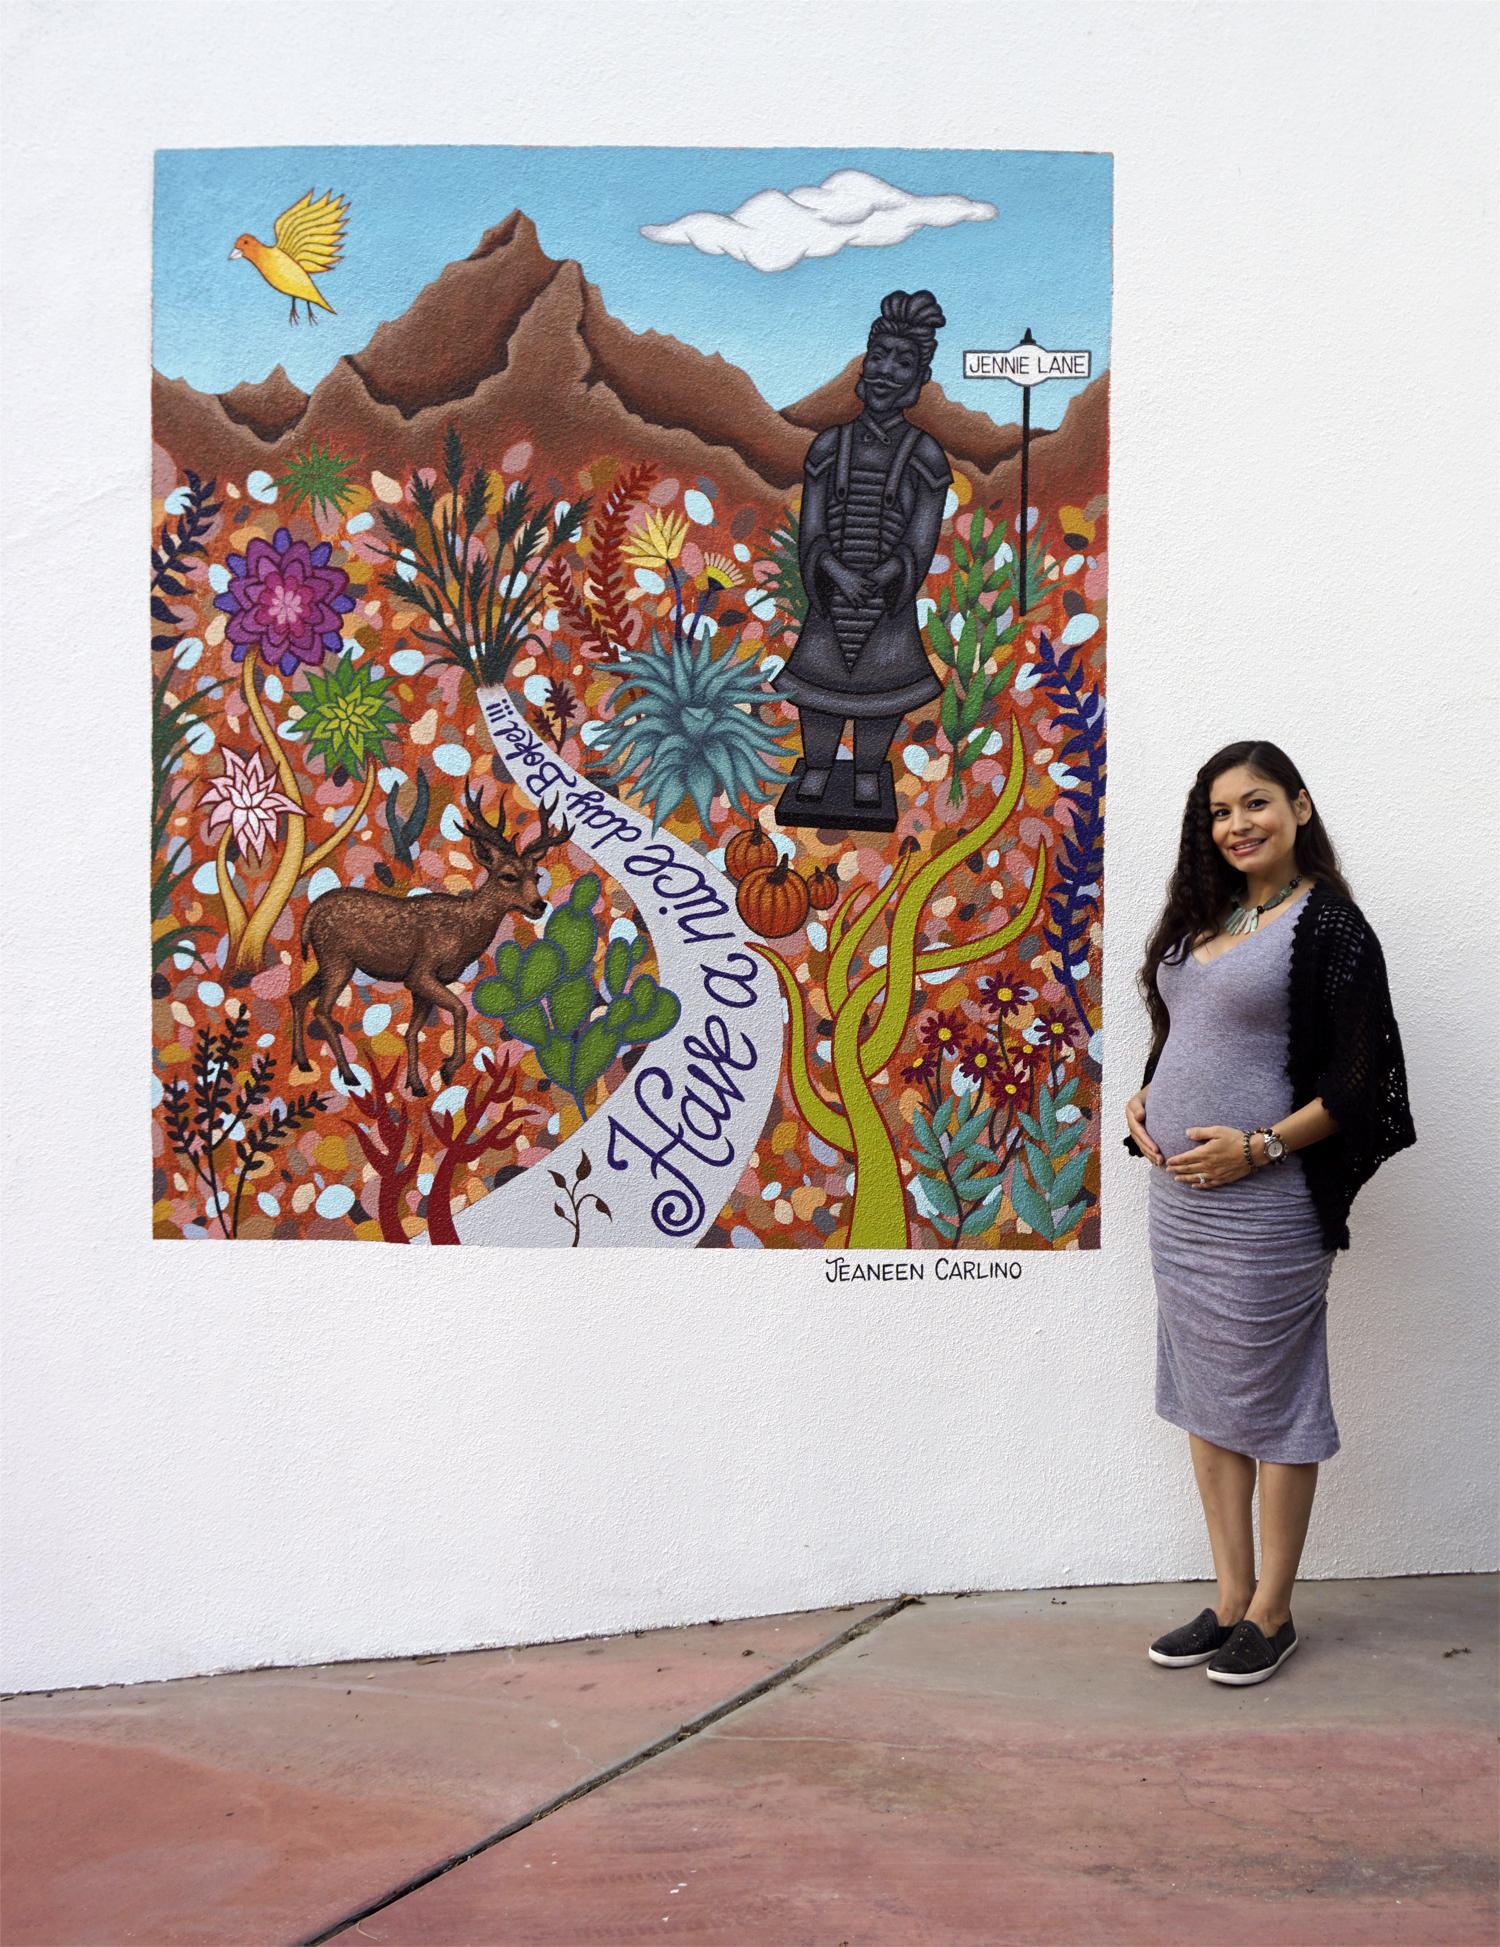 2017-Jeaneen Carlino-Mural Art-Painting-Garden of Laurel Canyon-2.jpg